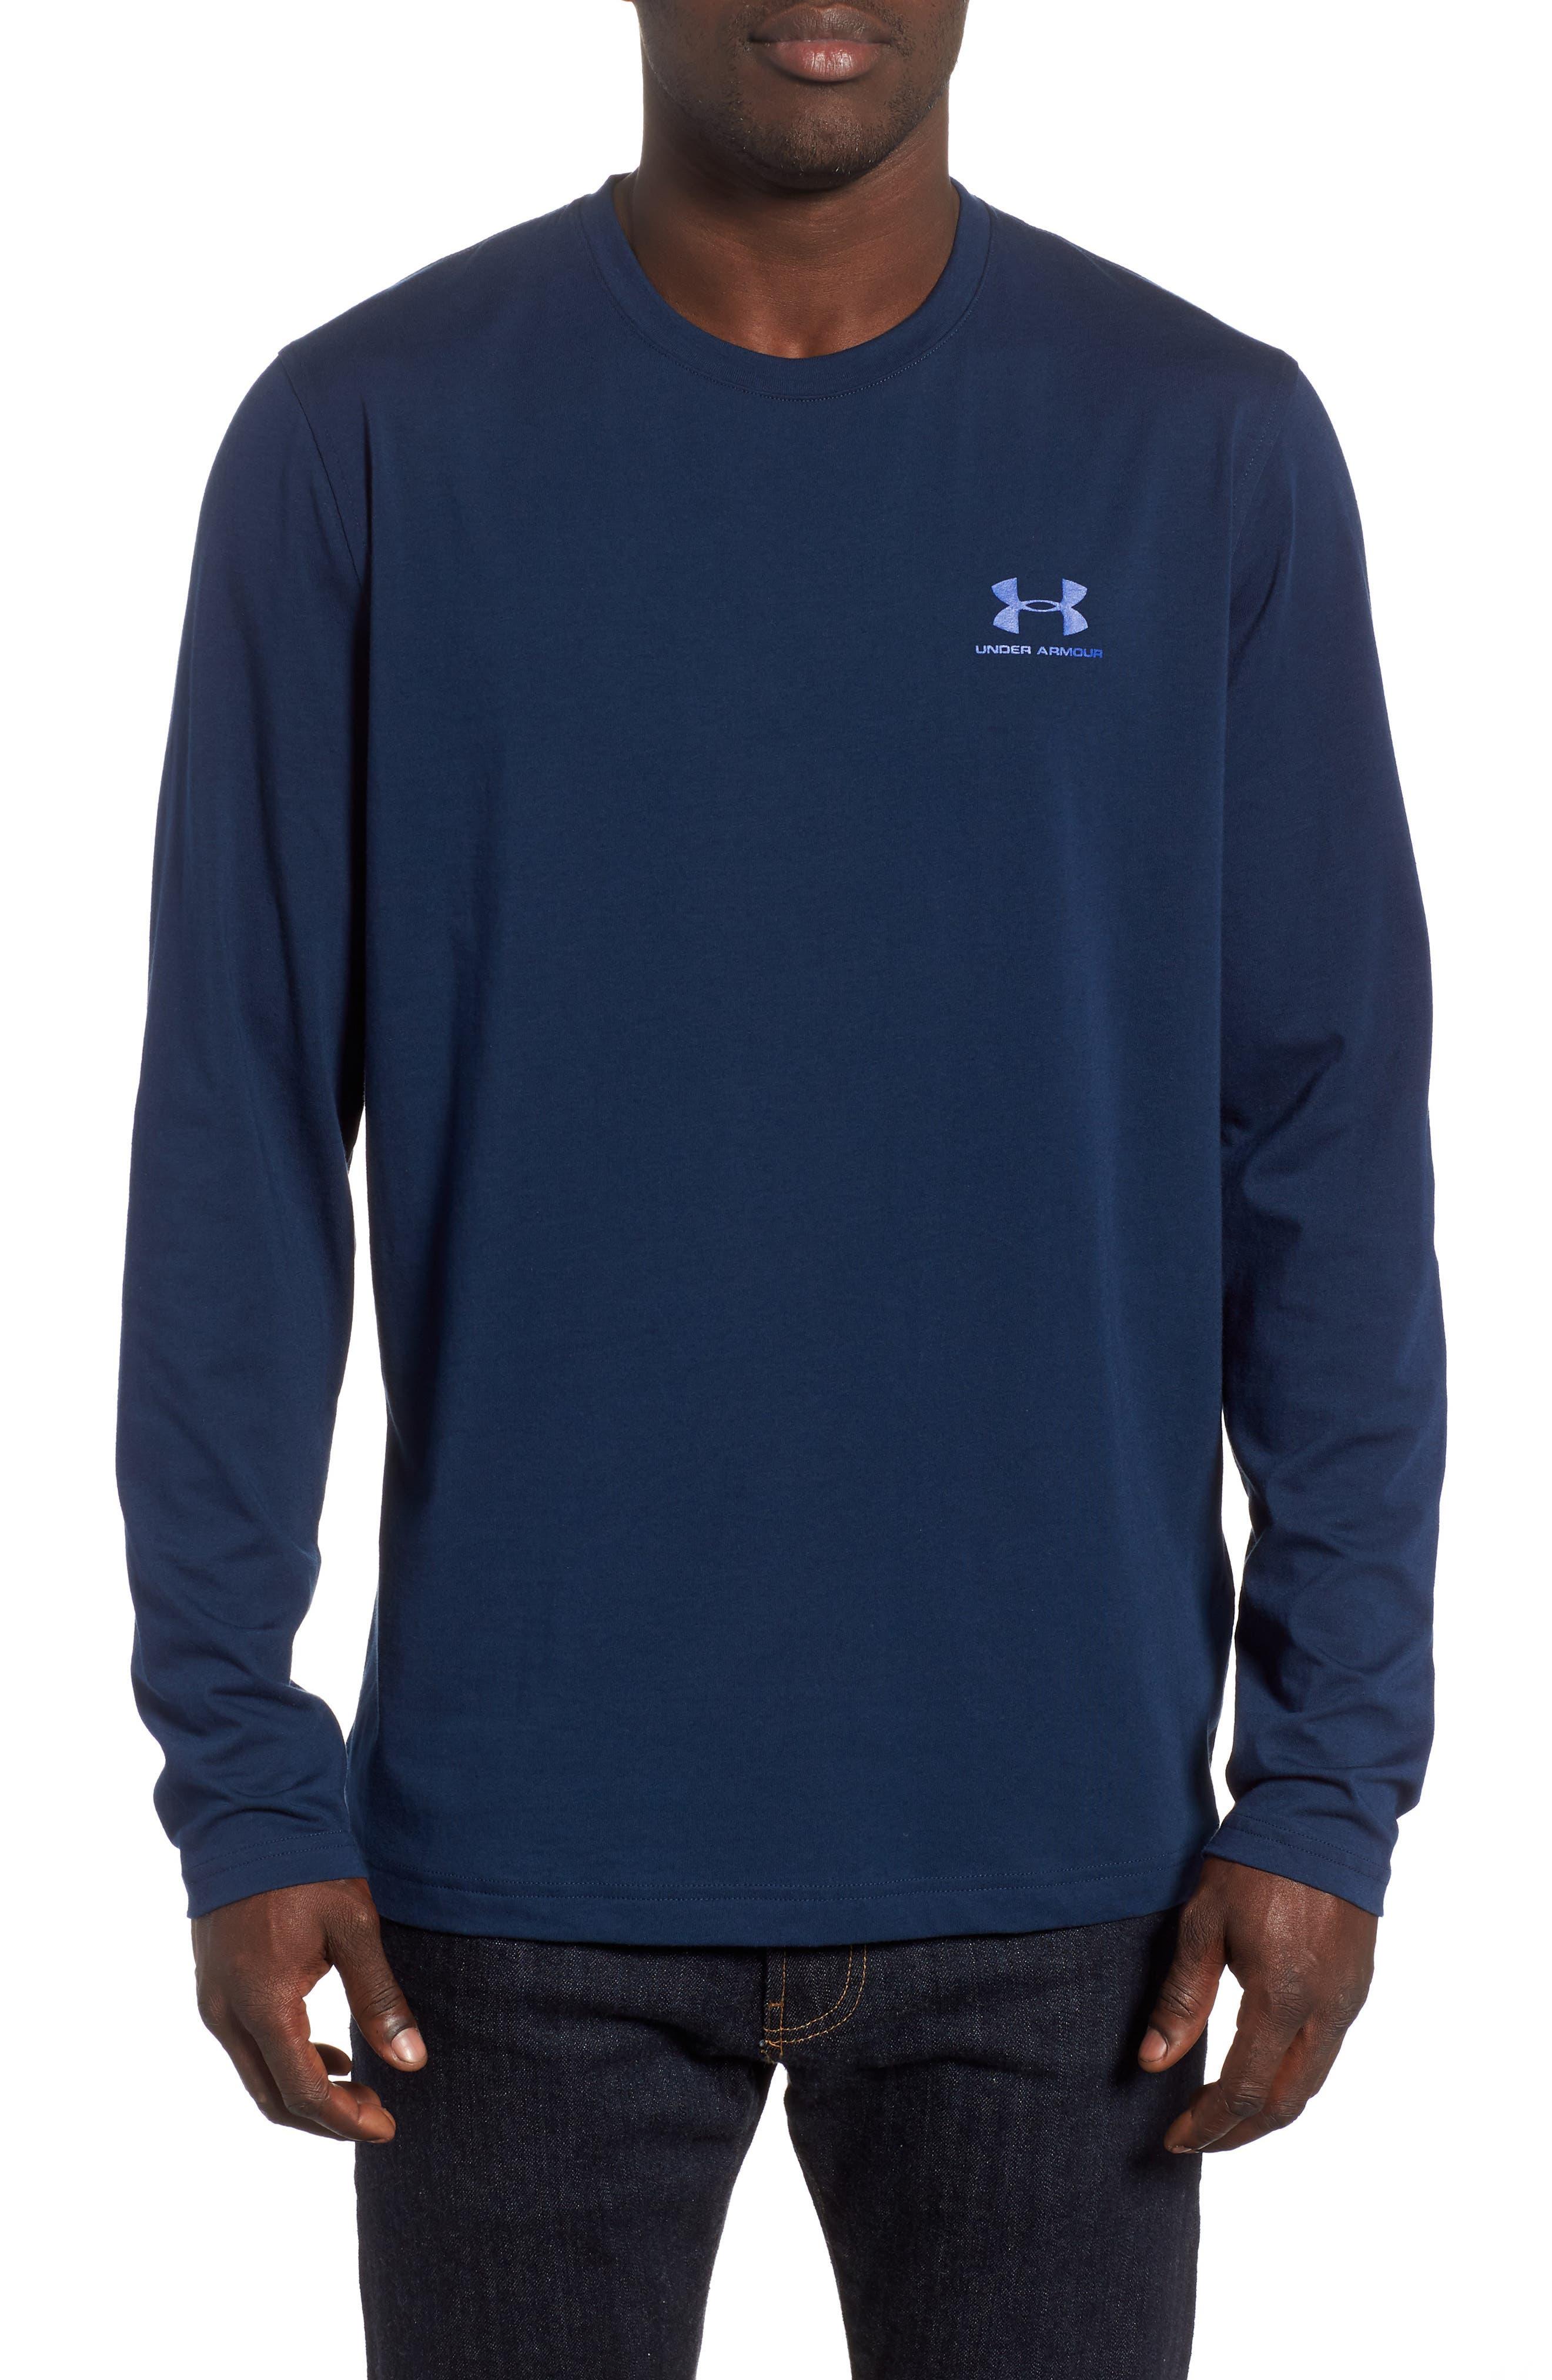 HeatGear<sup>®</sup> Long Sleeve Performance T-Shirt,                             Main thumbnail 1, color,                             ACADEMY/ ROYAL